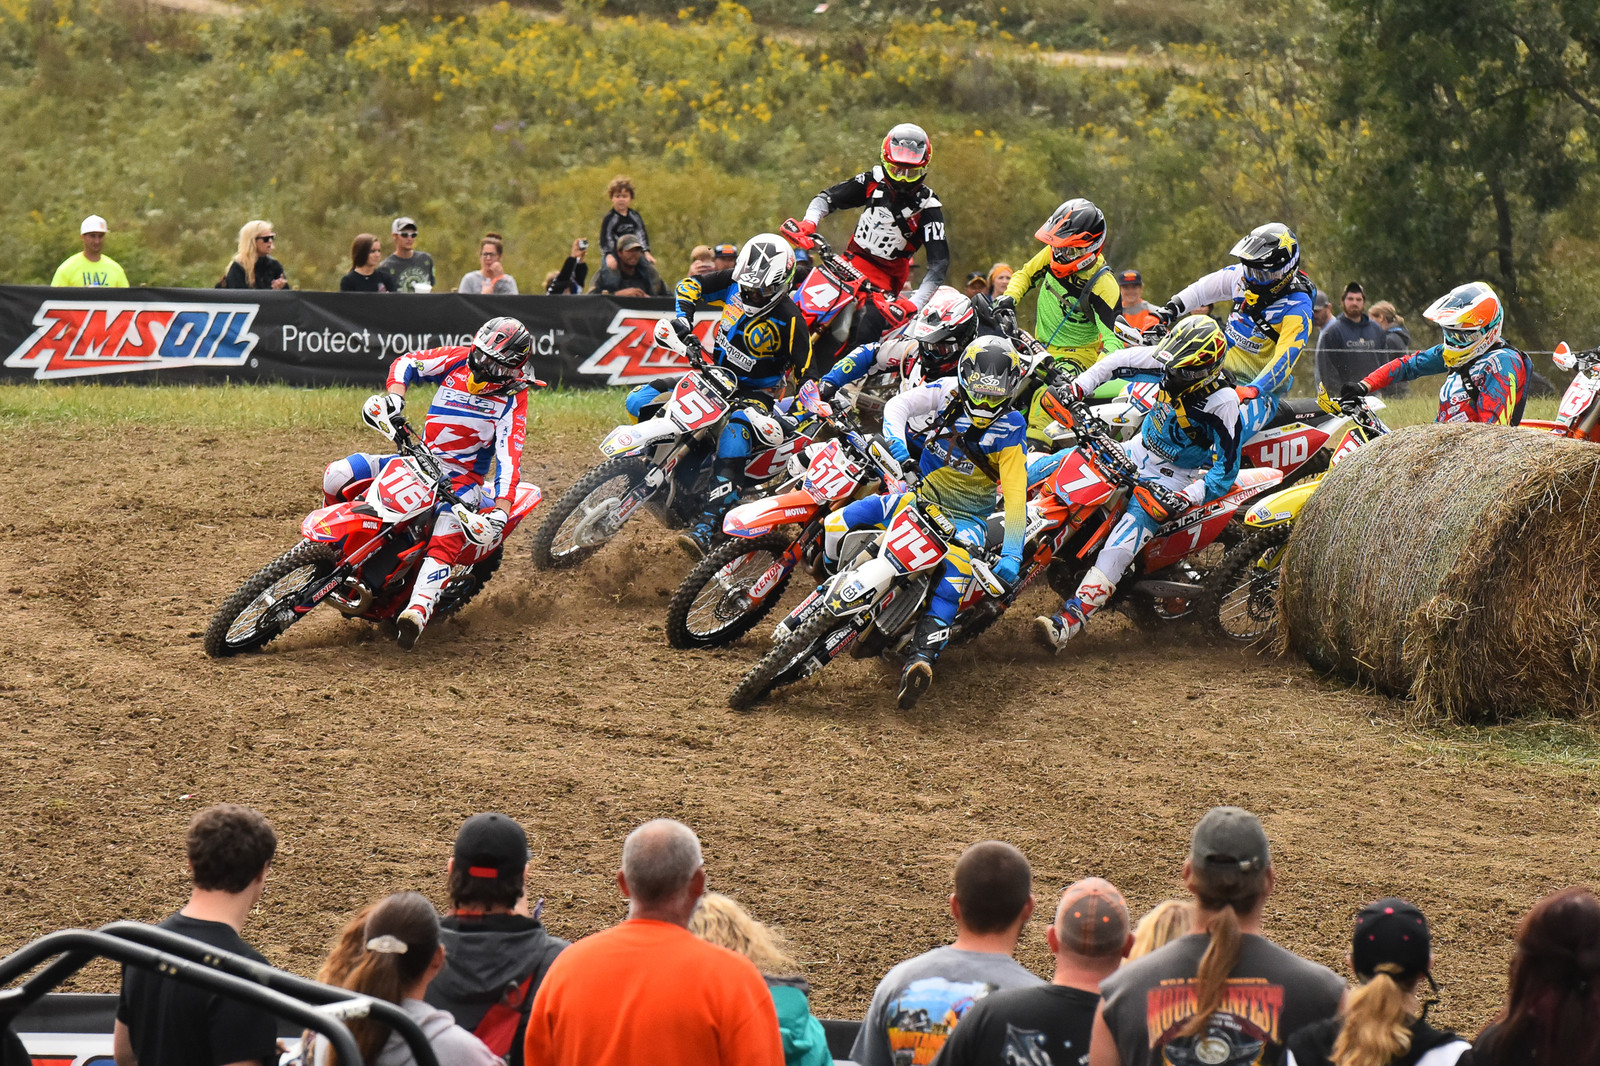 Johnny Aubert - Powerline Park GNCC - Motocross Pictures - Vital MX